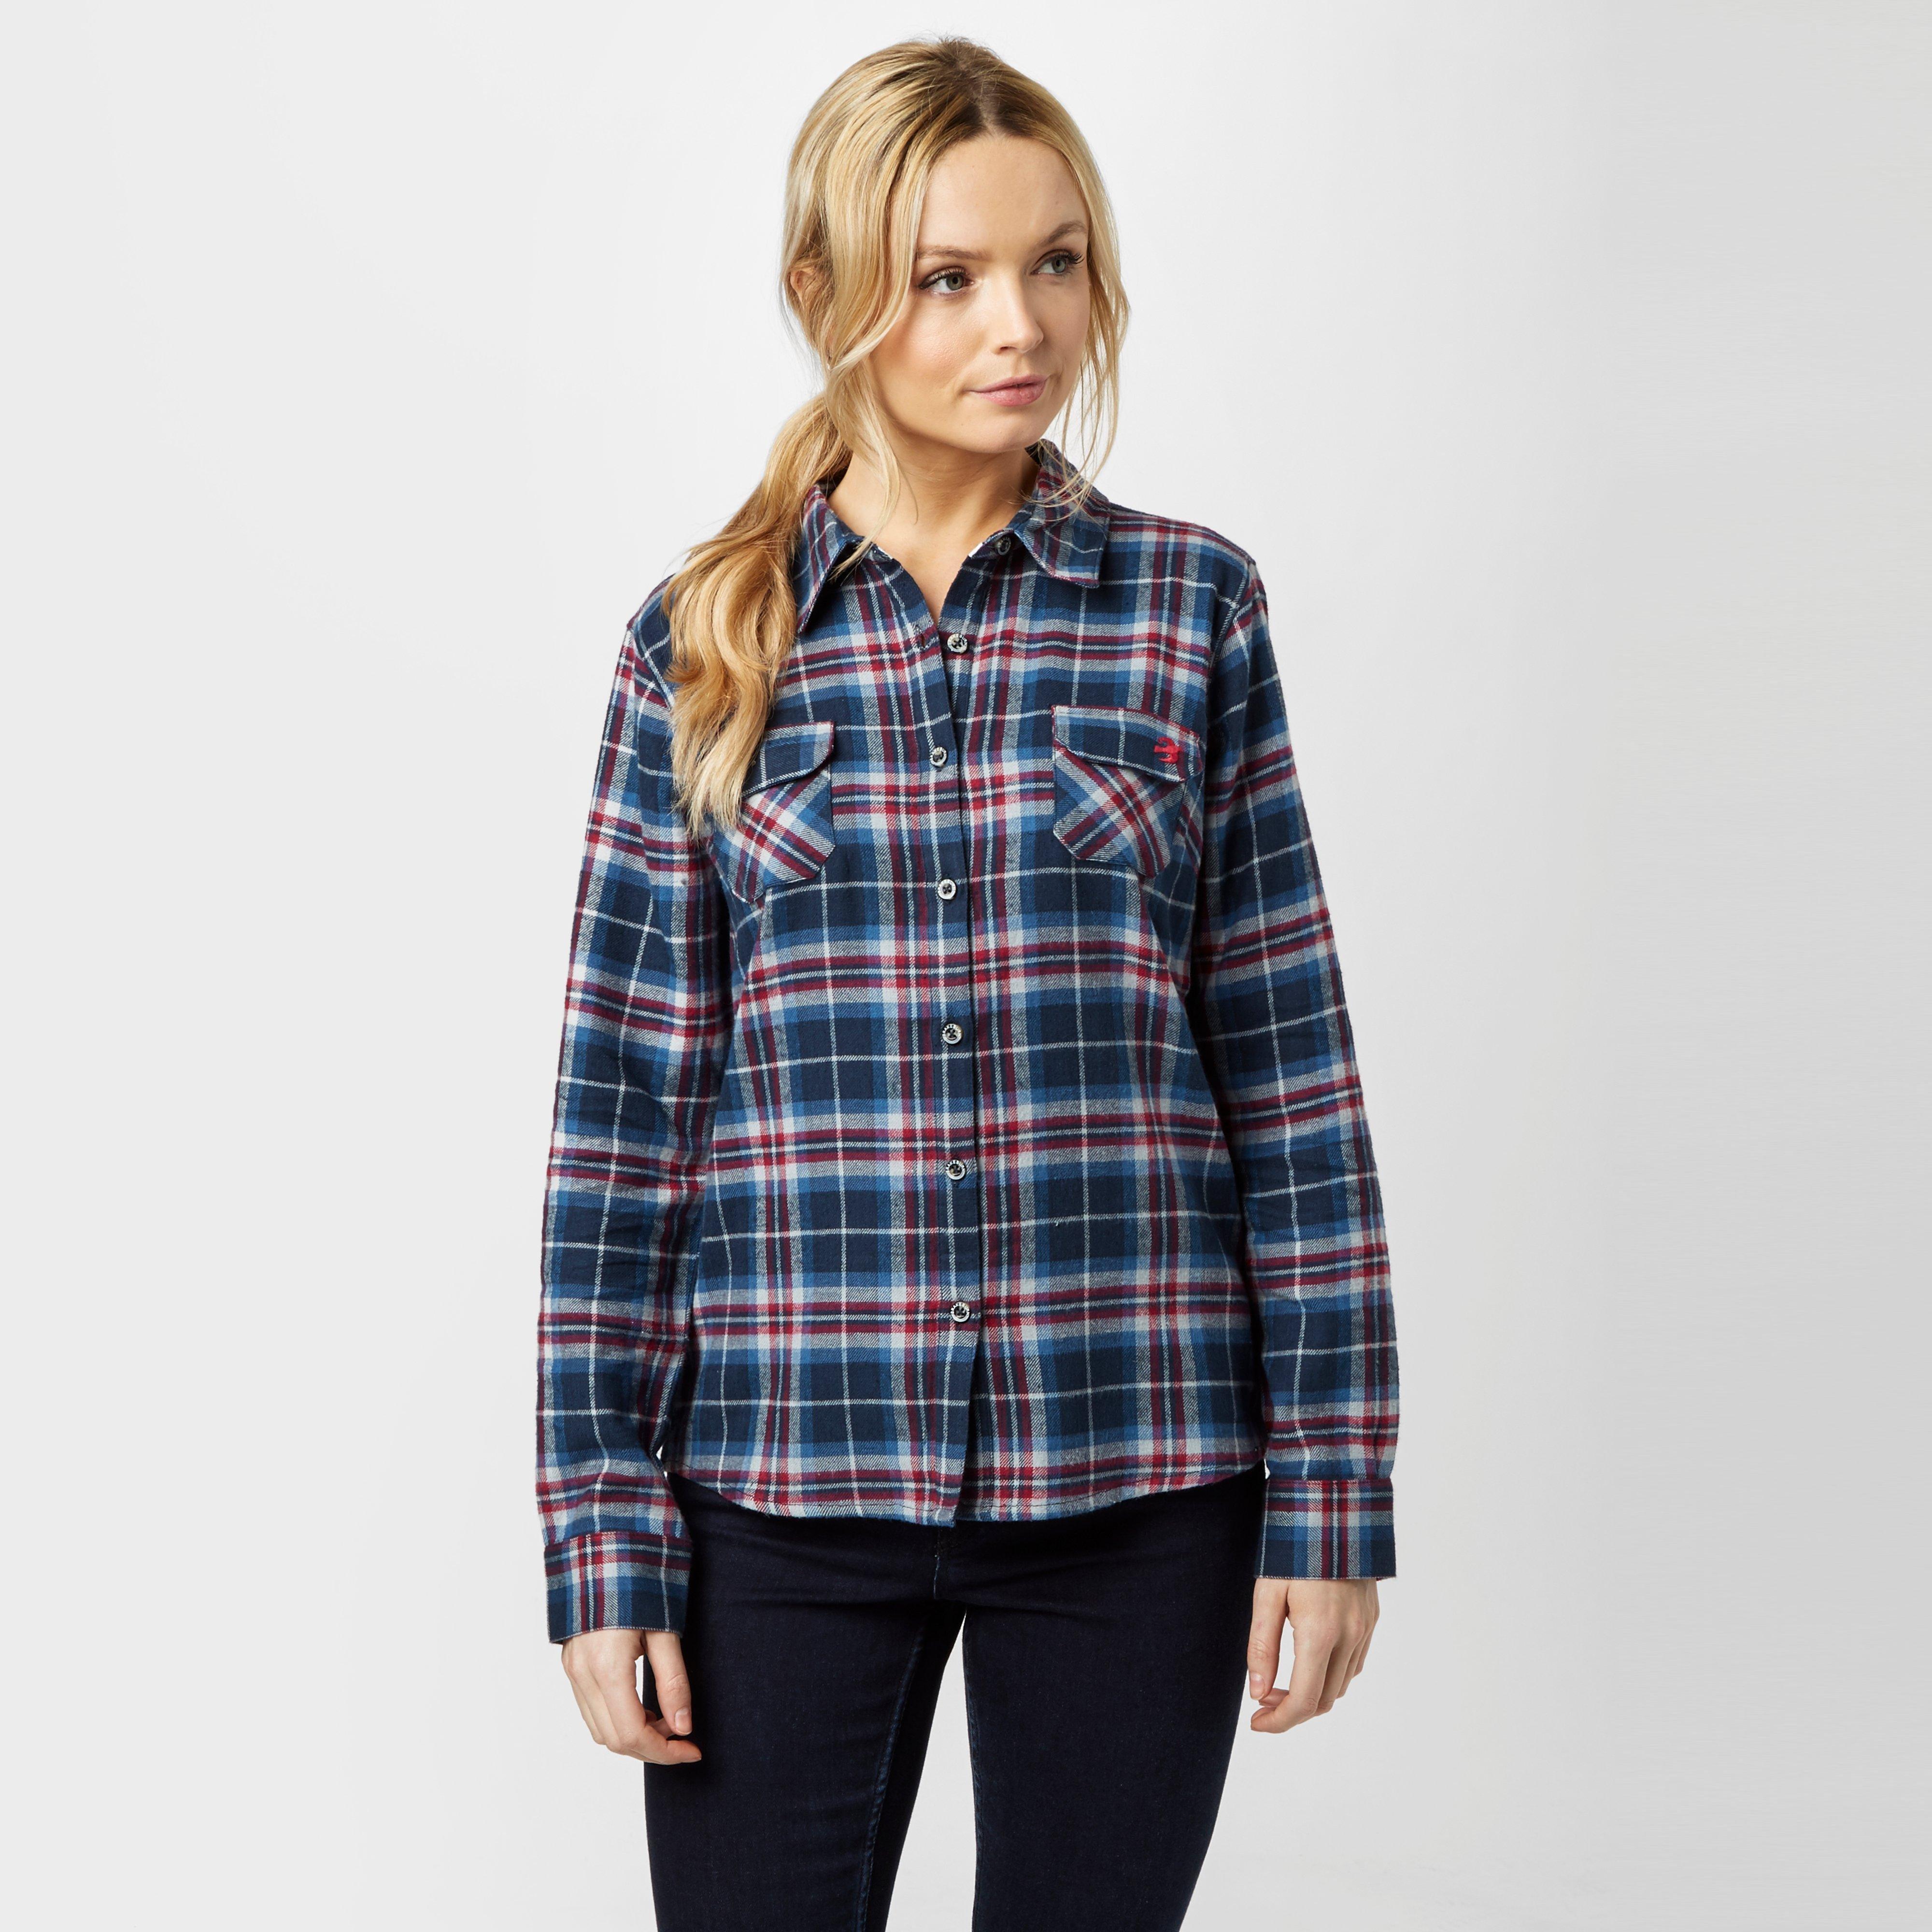 Brakeburn Womens Check Flannel Shirt - Nvy/nvy  Nvy/nvy